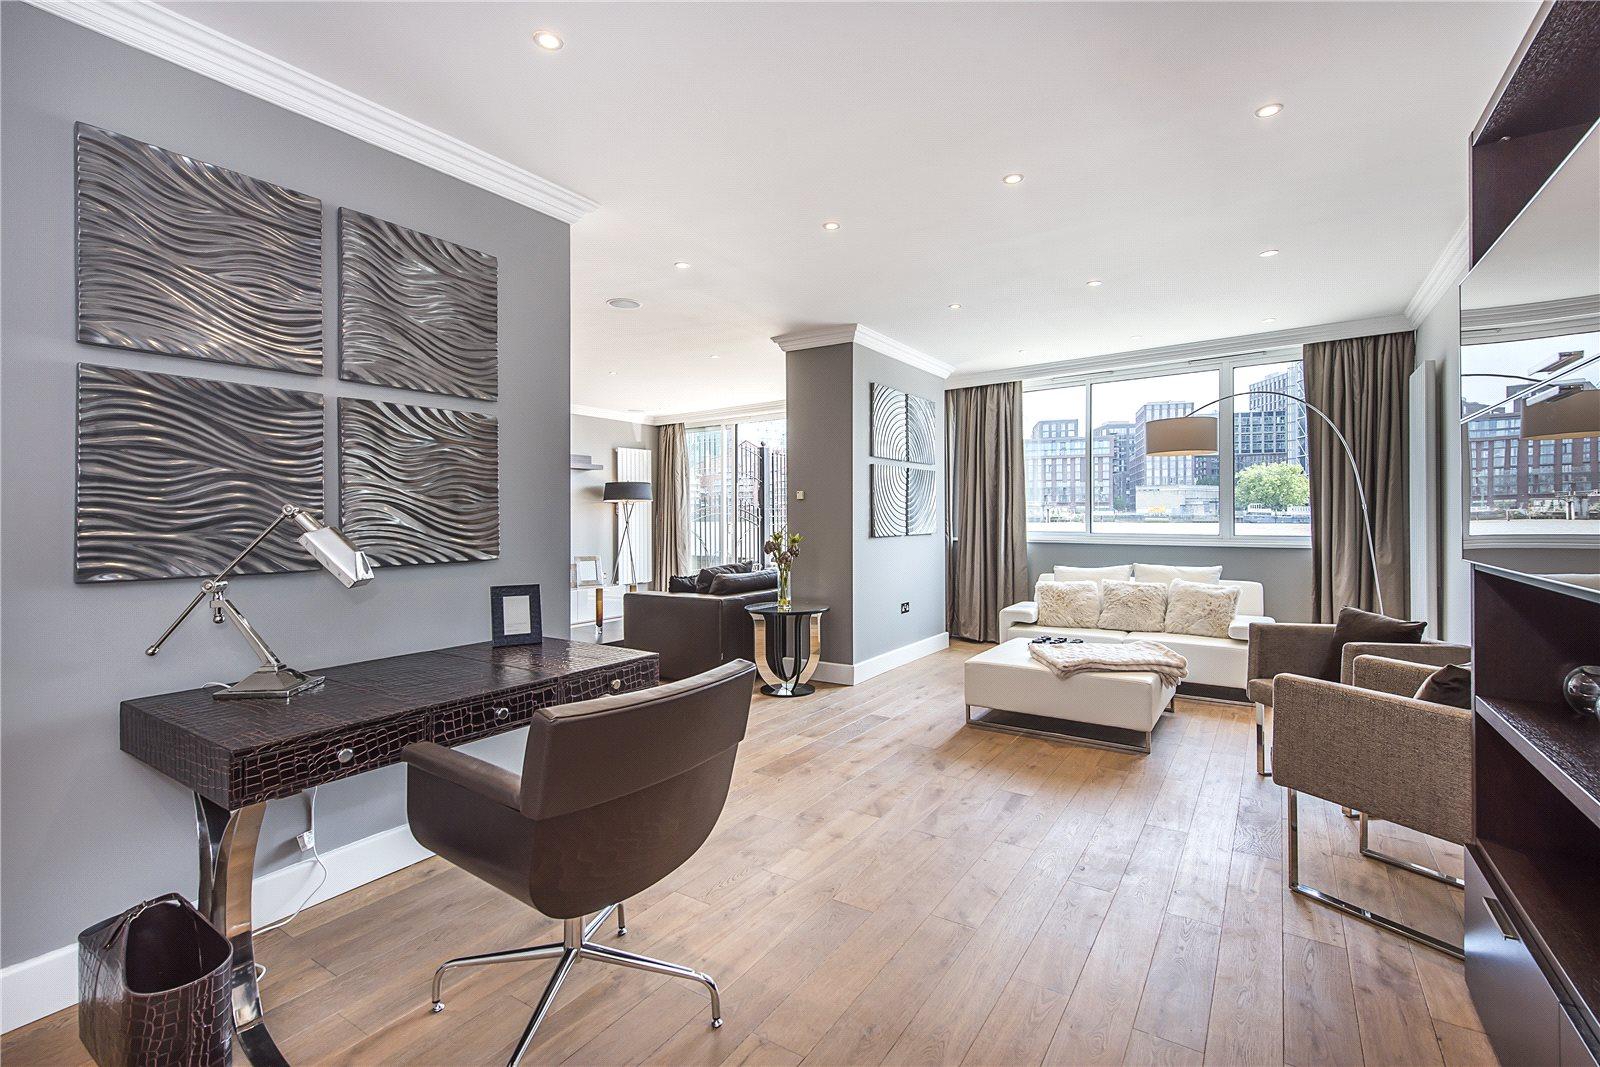 house extension loft conversion Grosvenor Road sw1v